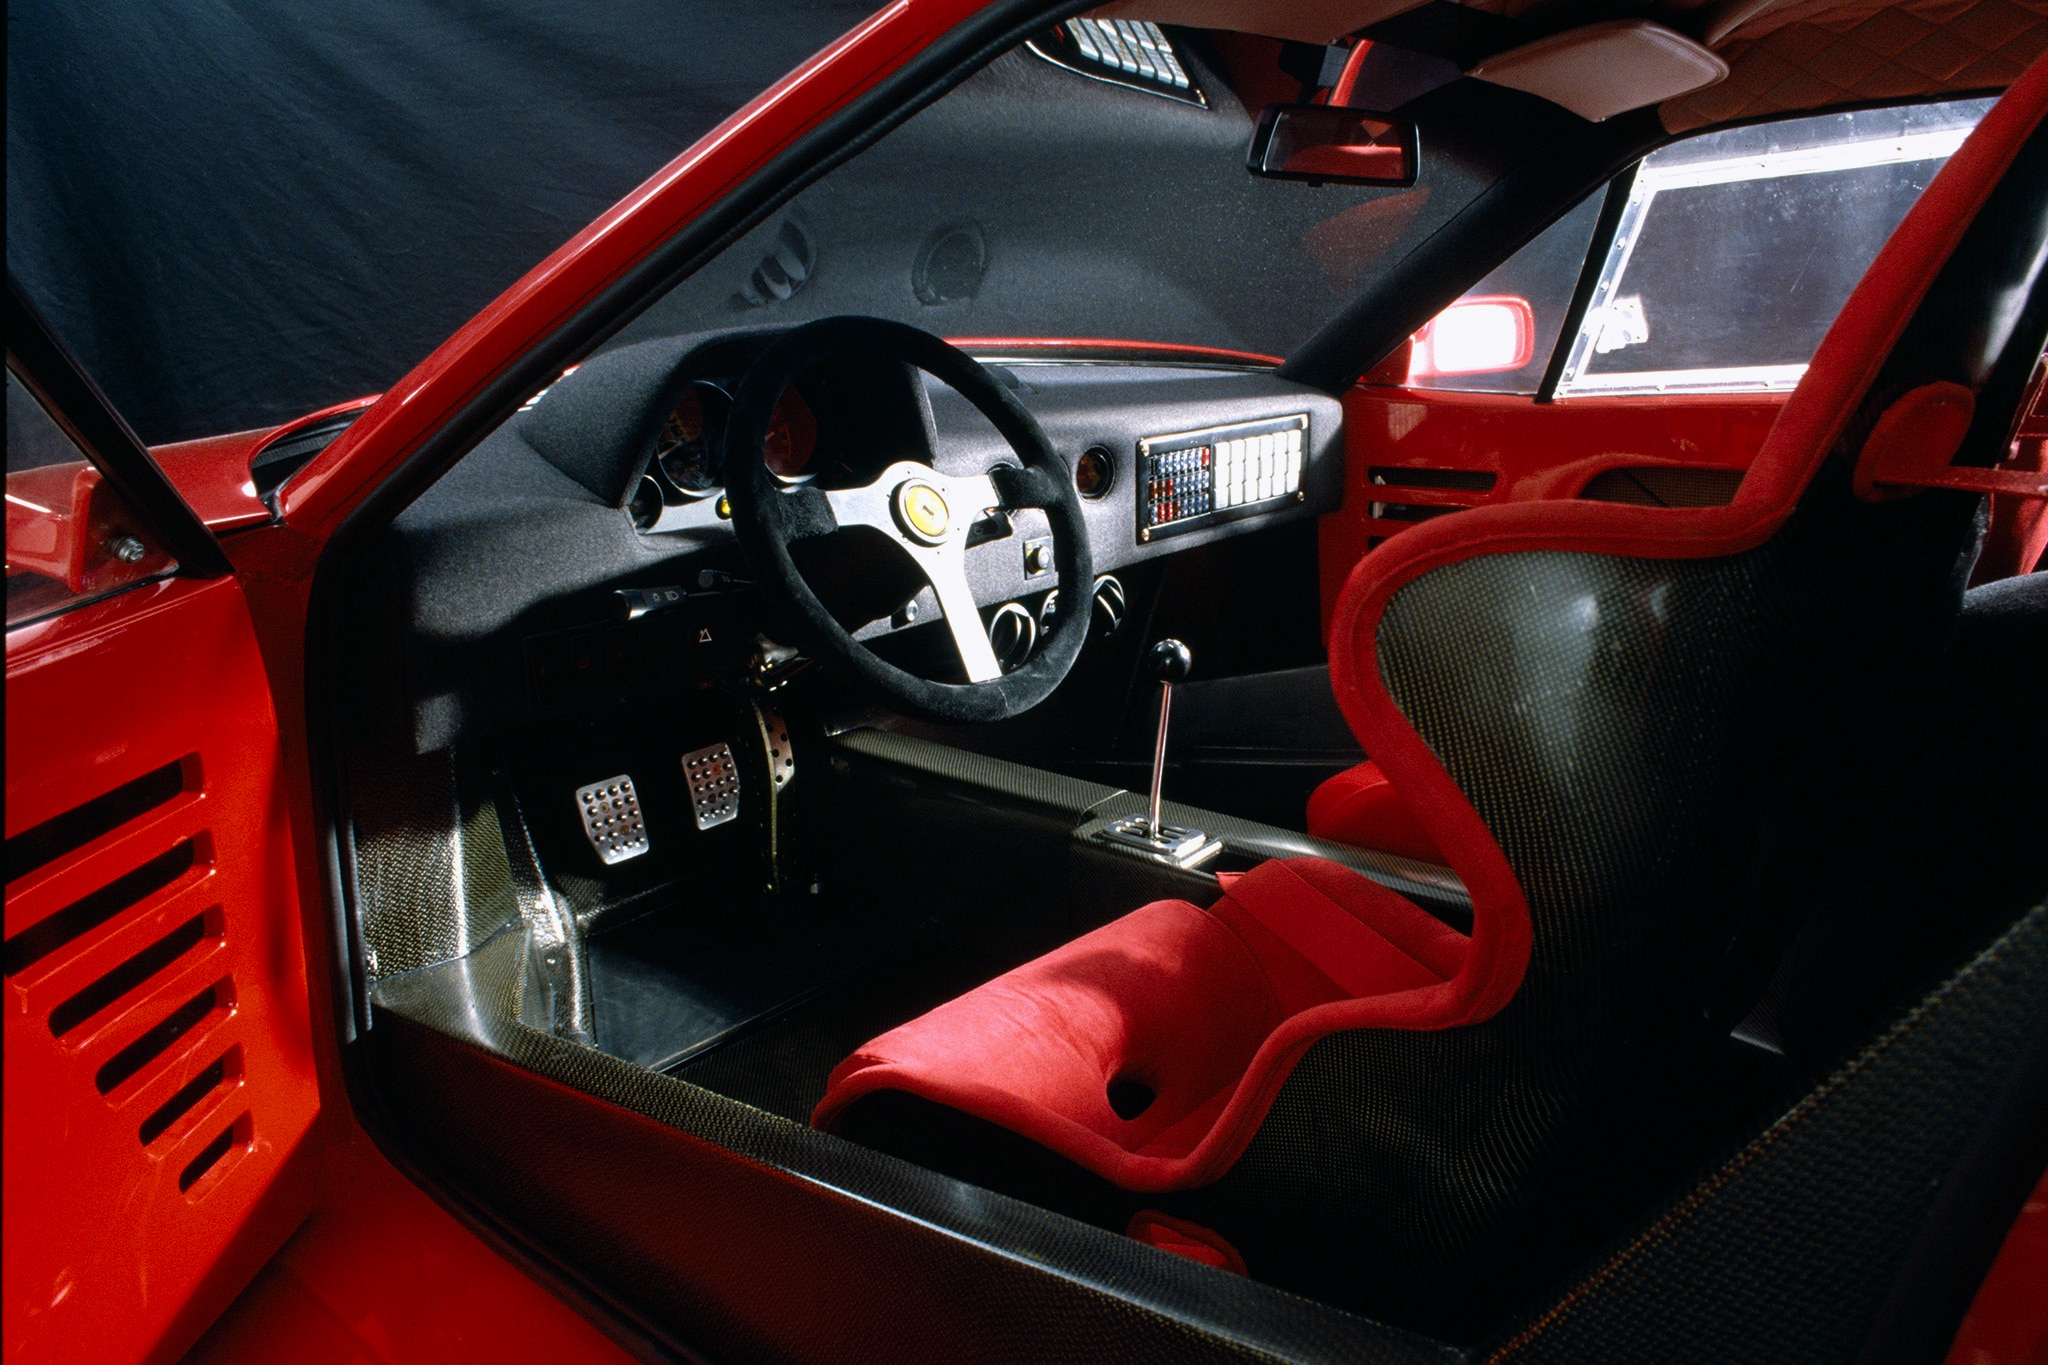 1987-Ferrari-F40-Interior Remarkable Ferrari Mondial Rear Window Motor Cars Trend